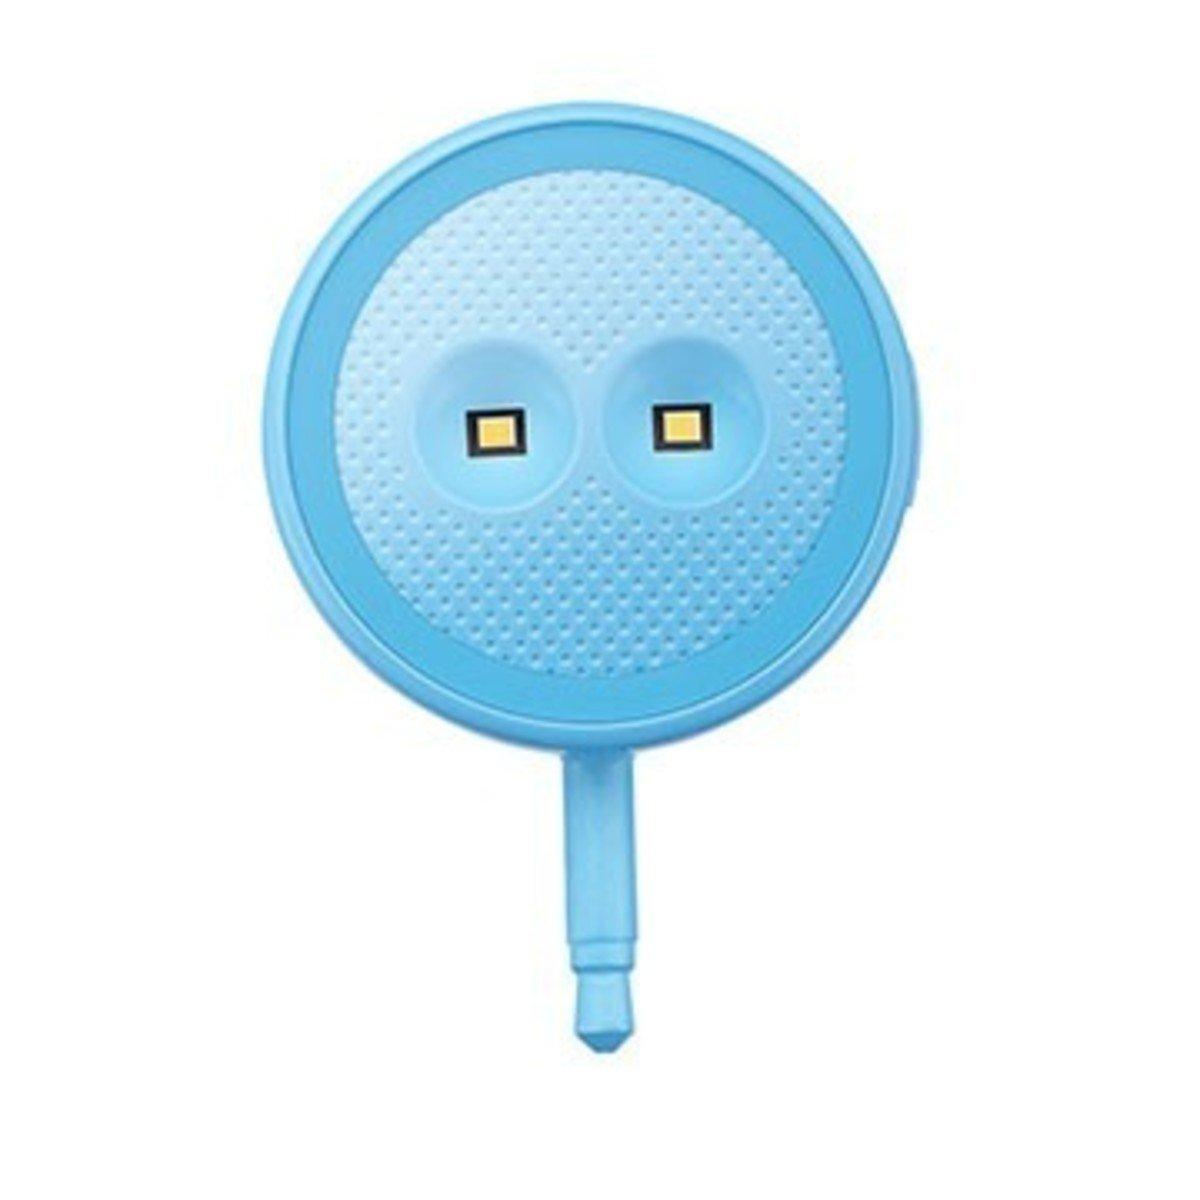 LOLLIFLASH 雙色溫 LED 補光燈 - 藍色